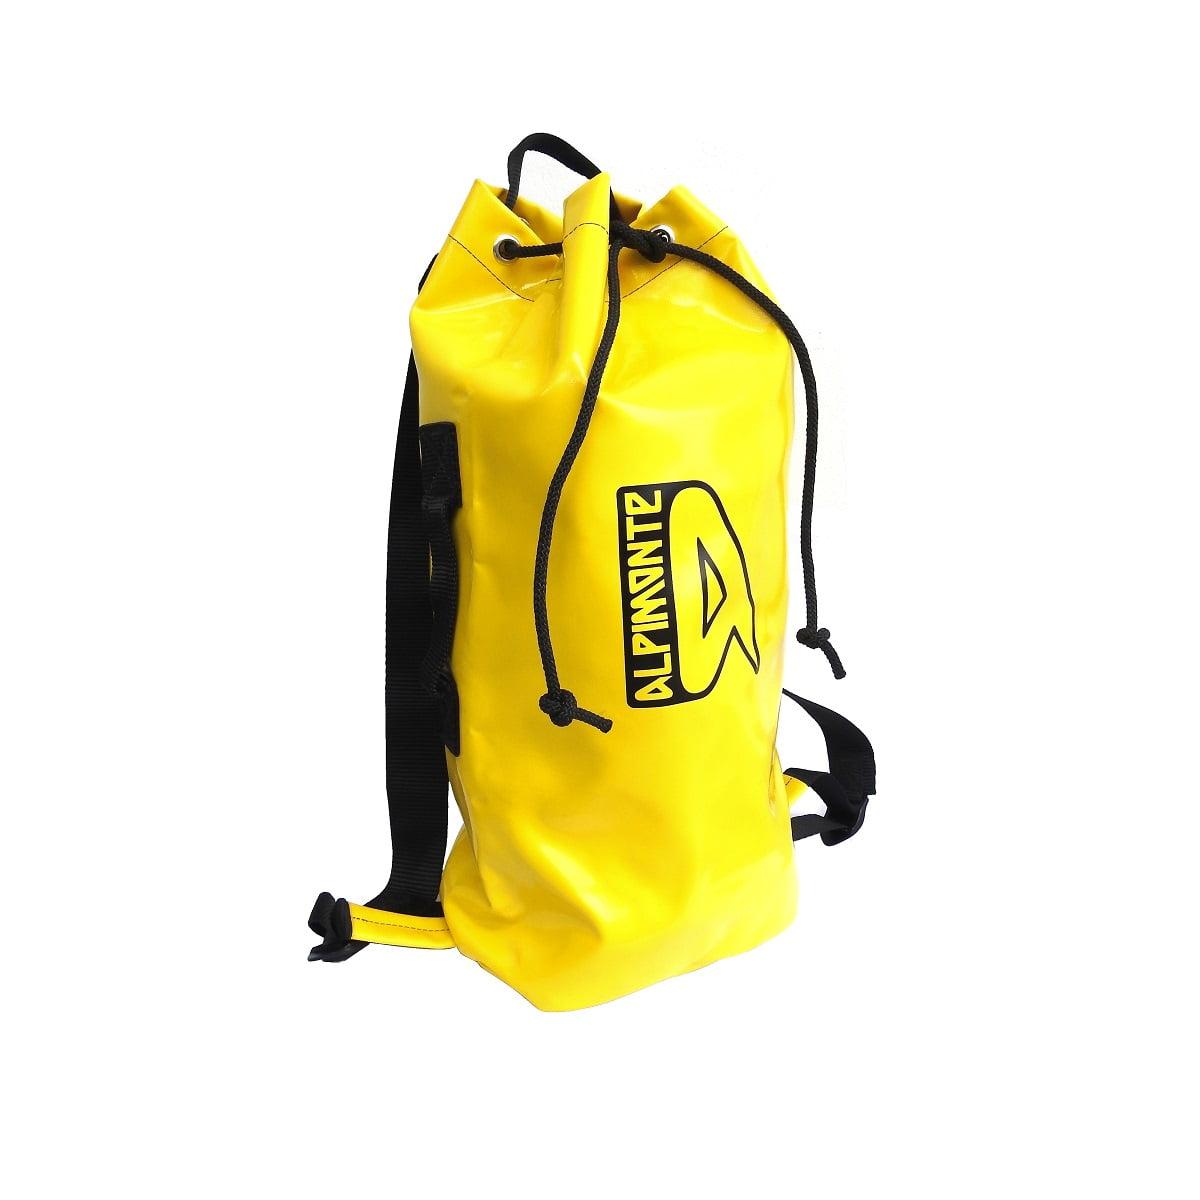 Mochila Saco de Espeleologia Carso Mini 16 Litros Amarela (Exclusividade Alpimonte)